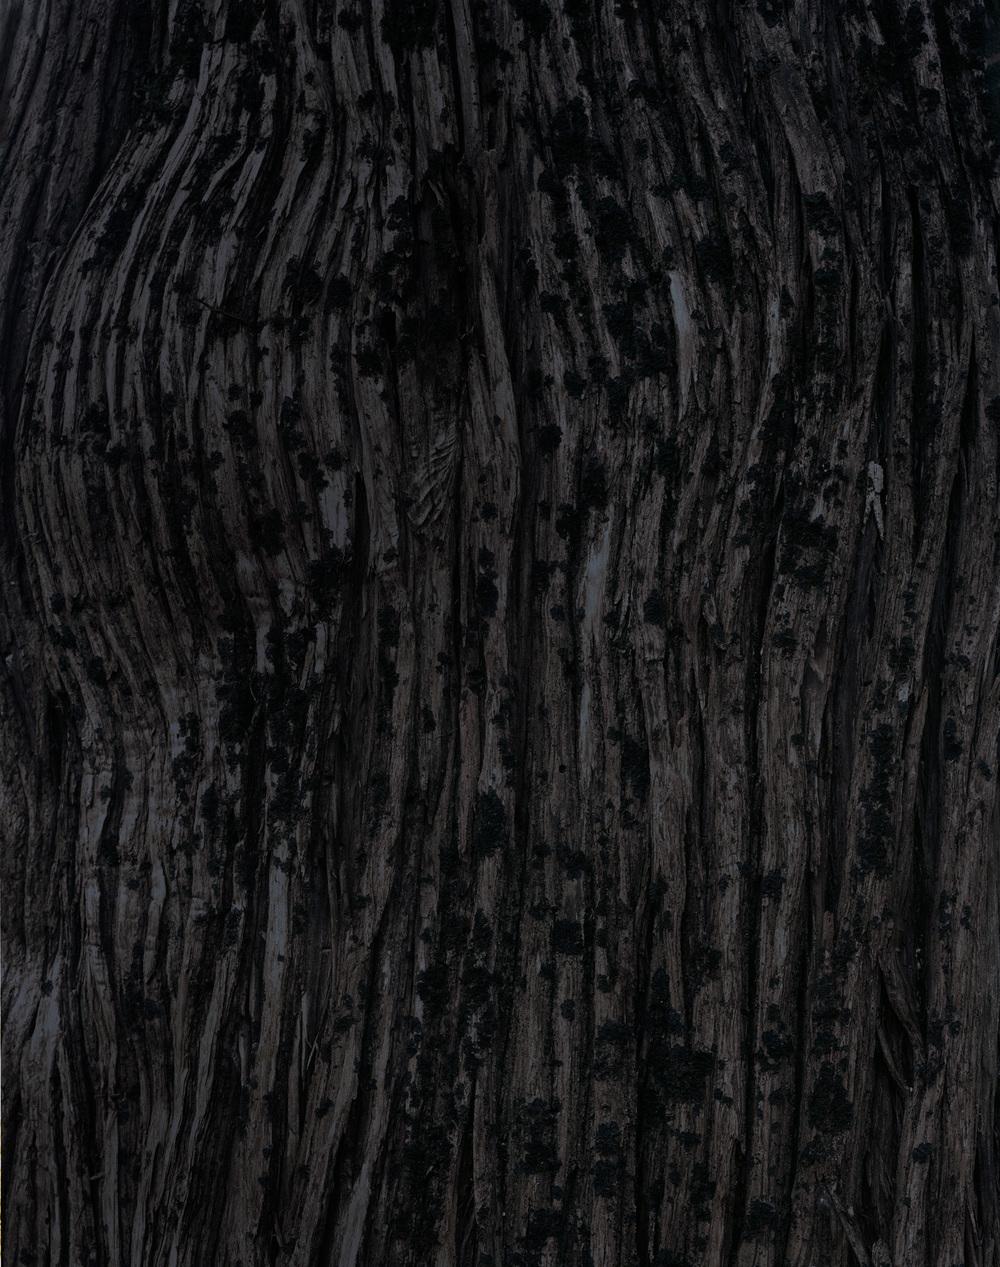 bark 10 017.jpg